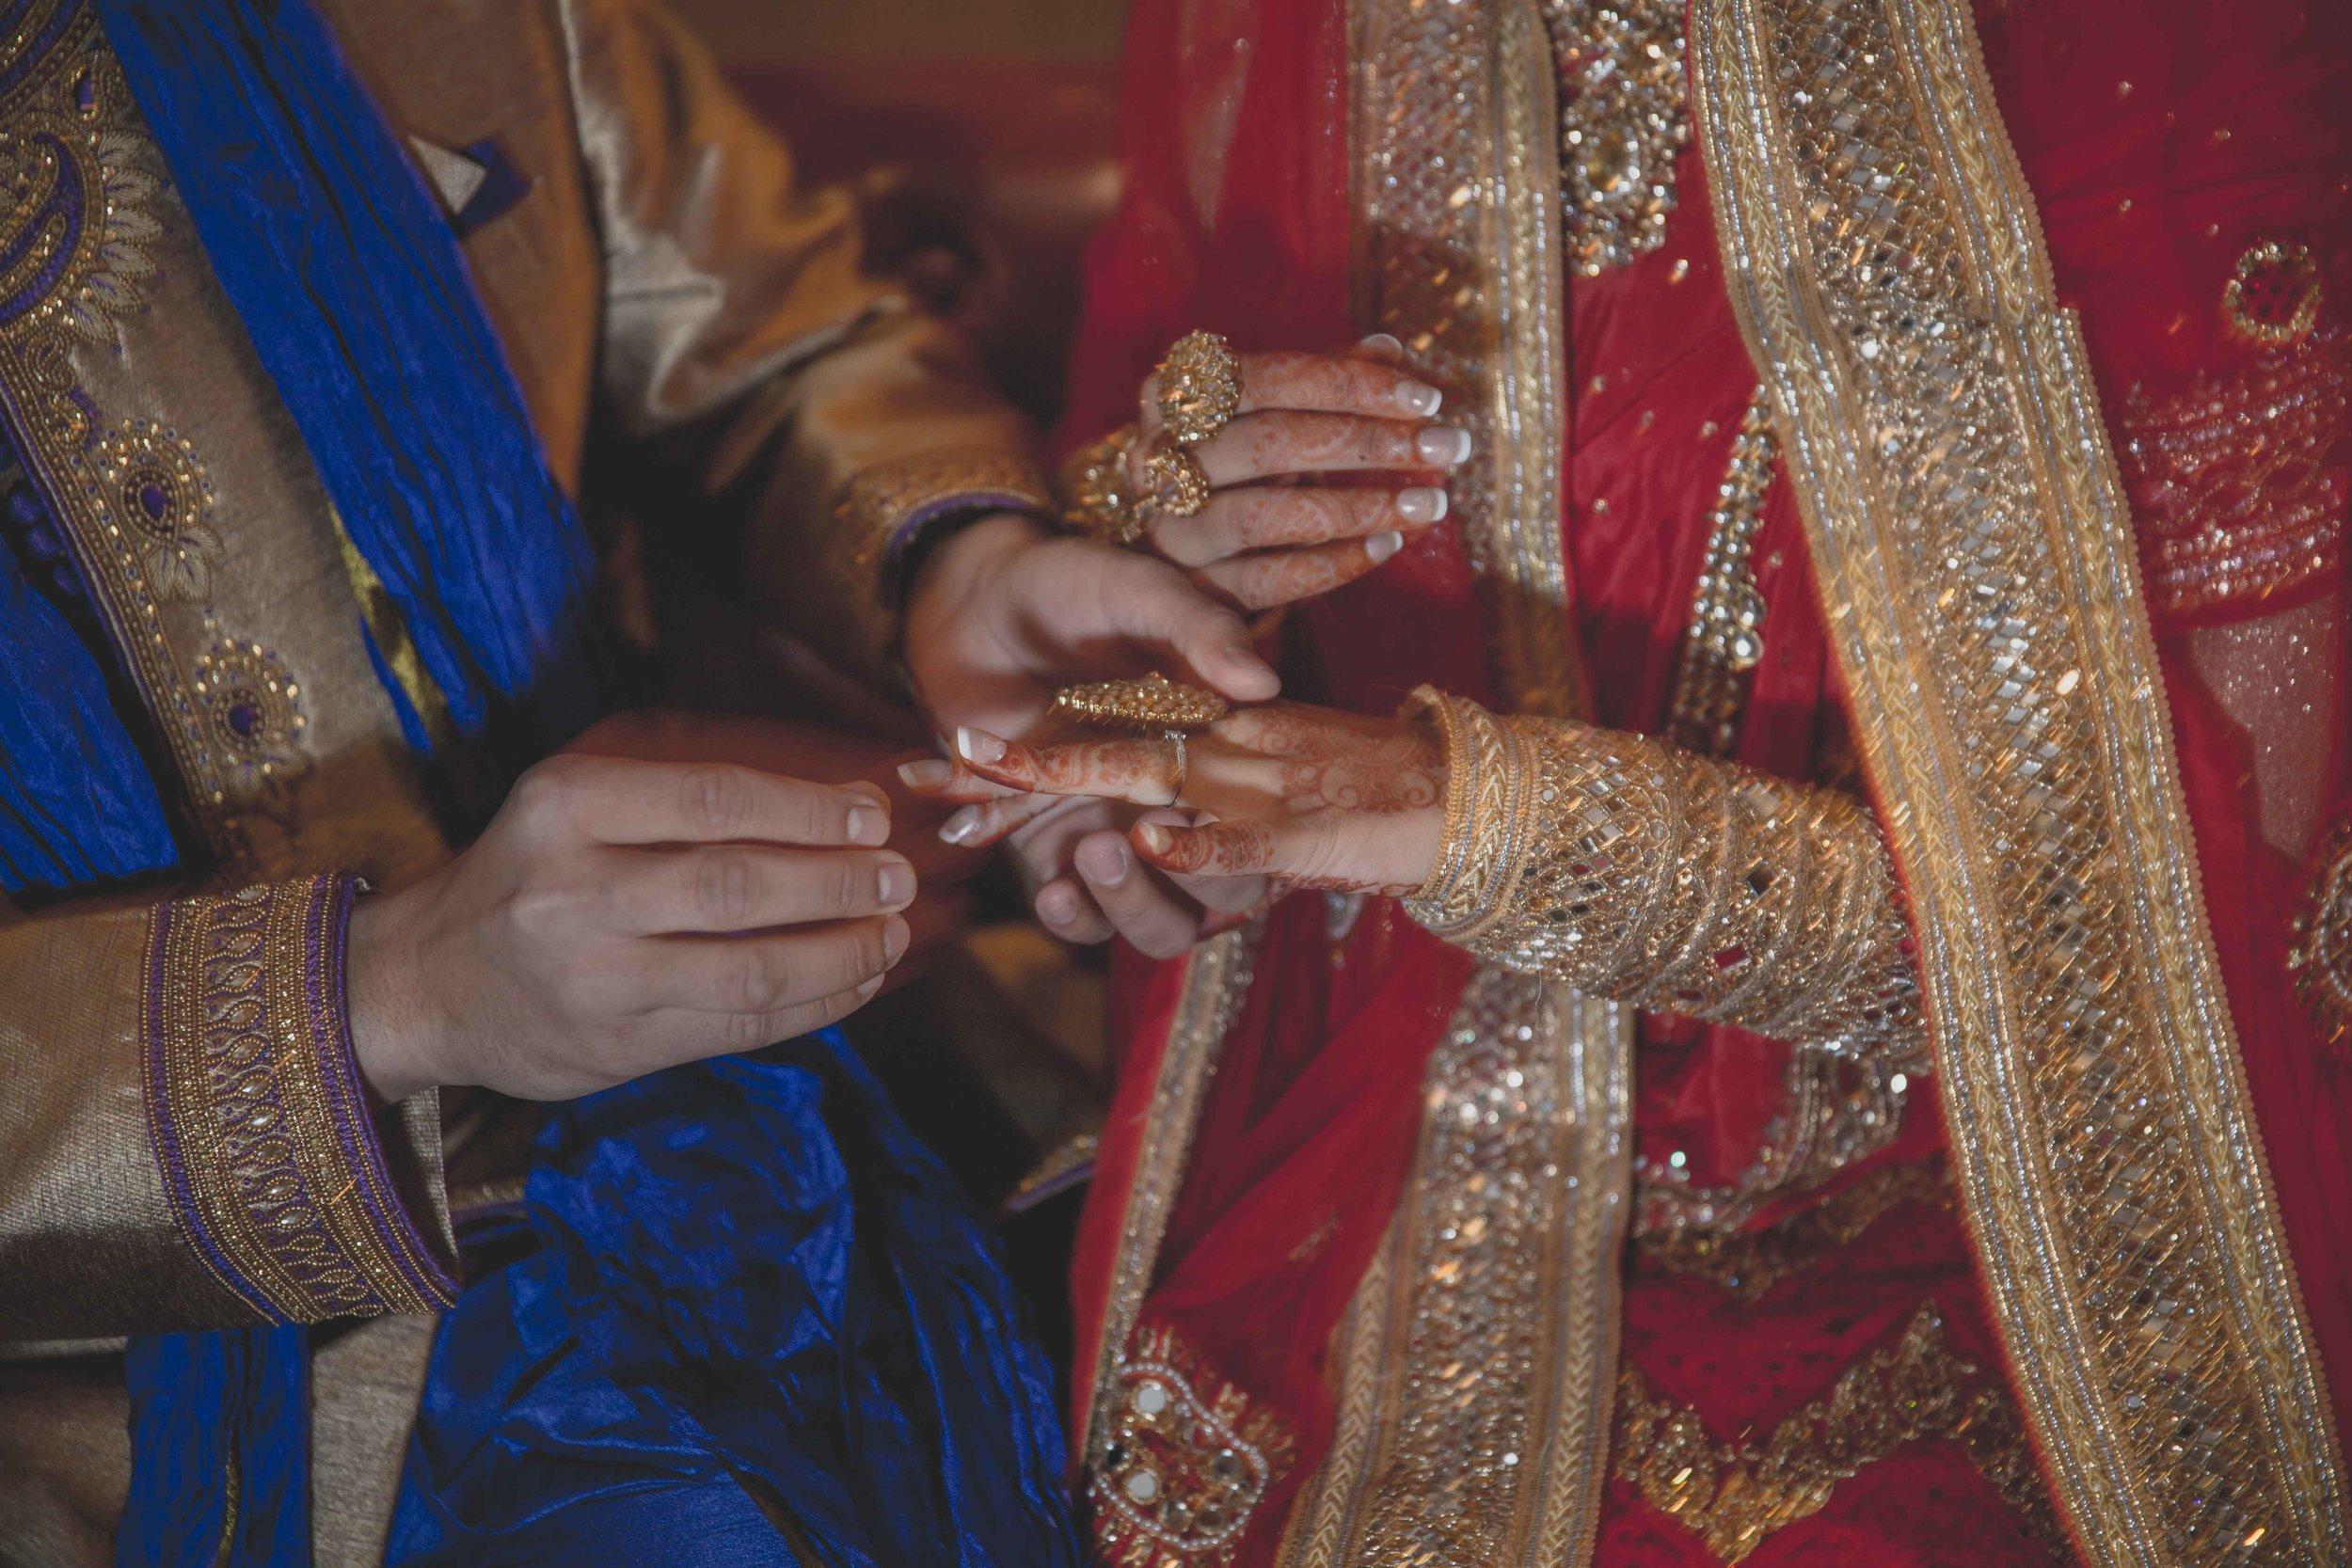 Female-wedding-photographer-birmingham-muslim-wedding-natalia-smith-photography-16.jpg